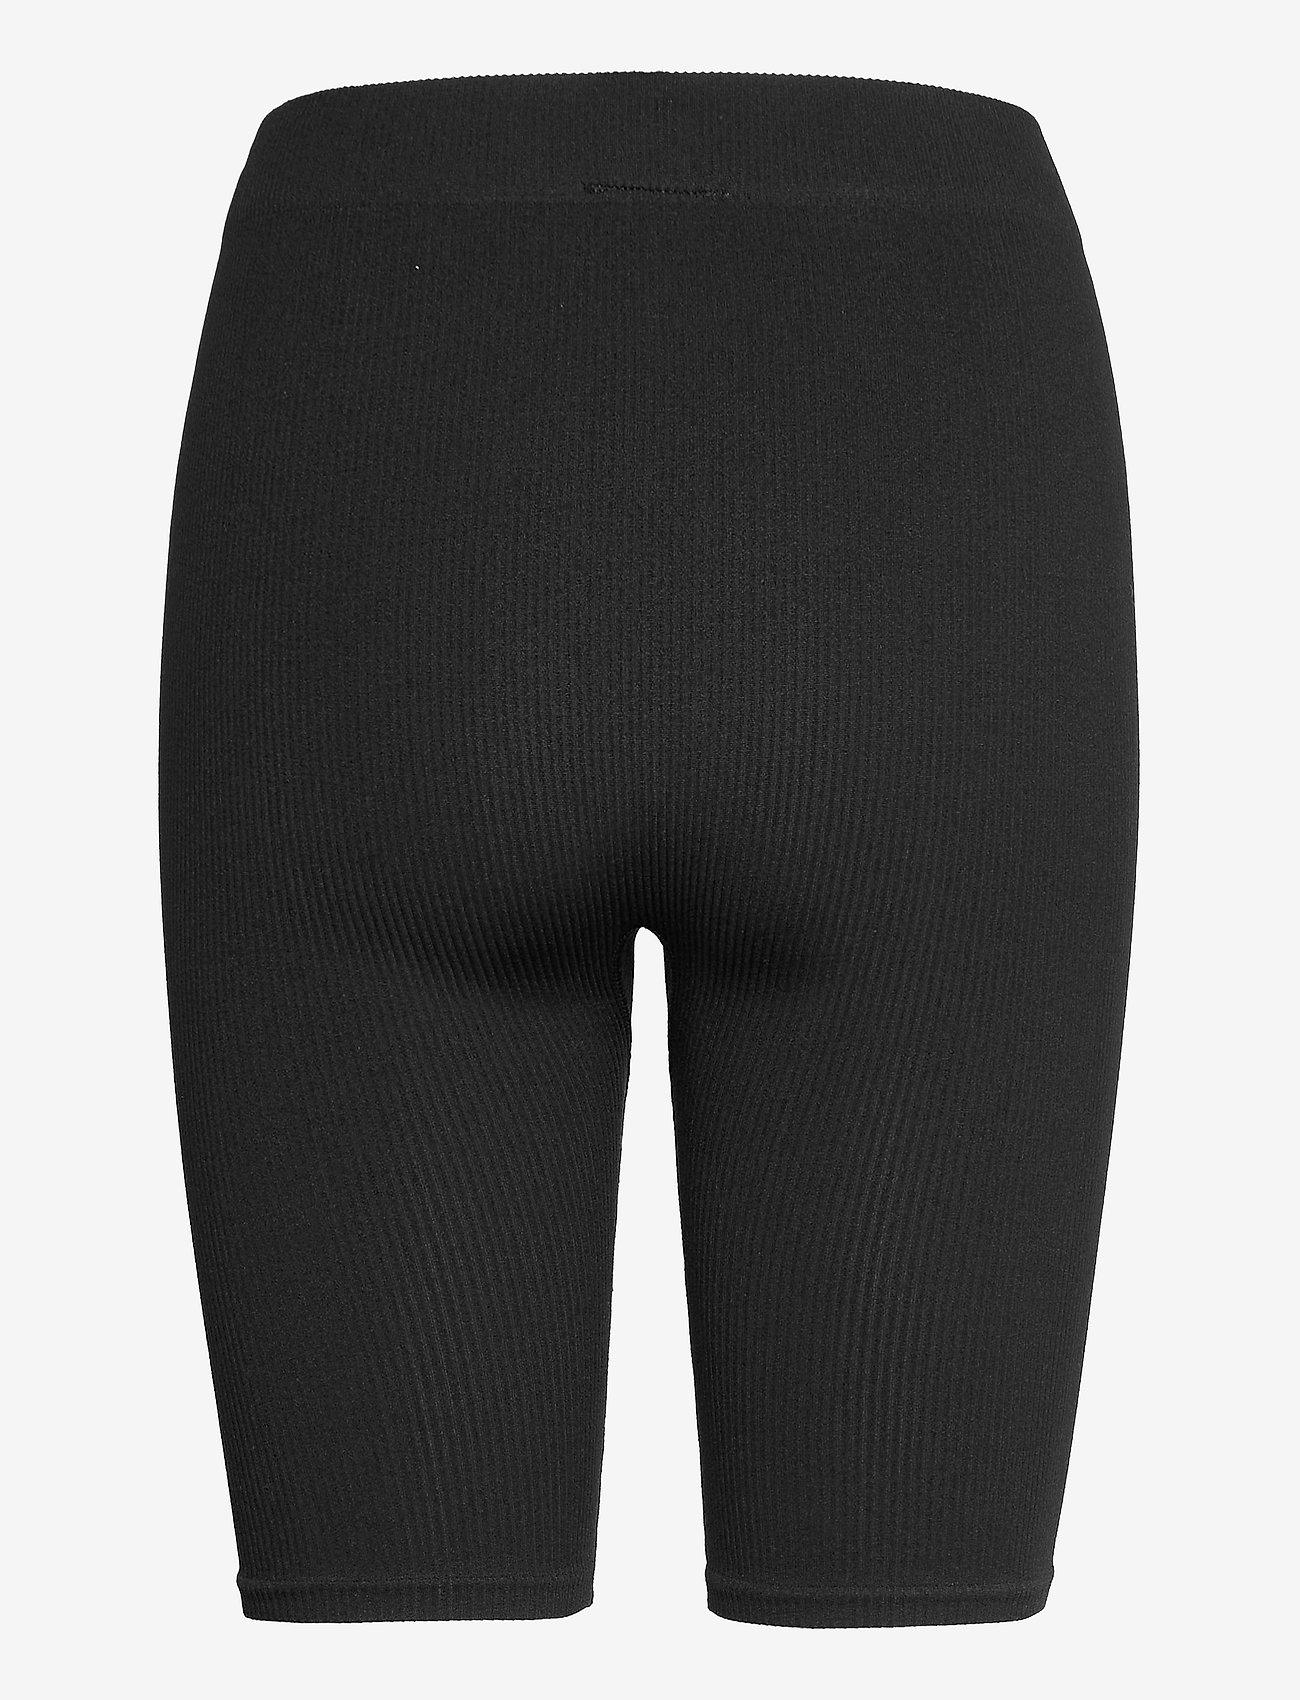 Vero Moda - VMEVE SHORTS - cycling shorts - black - 1